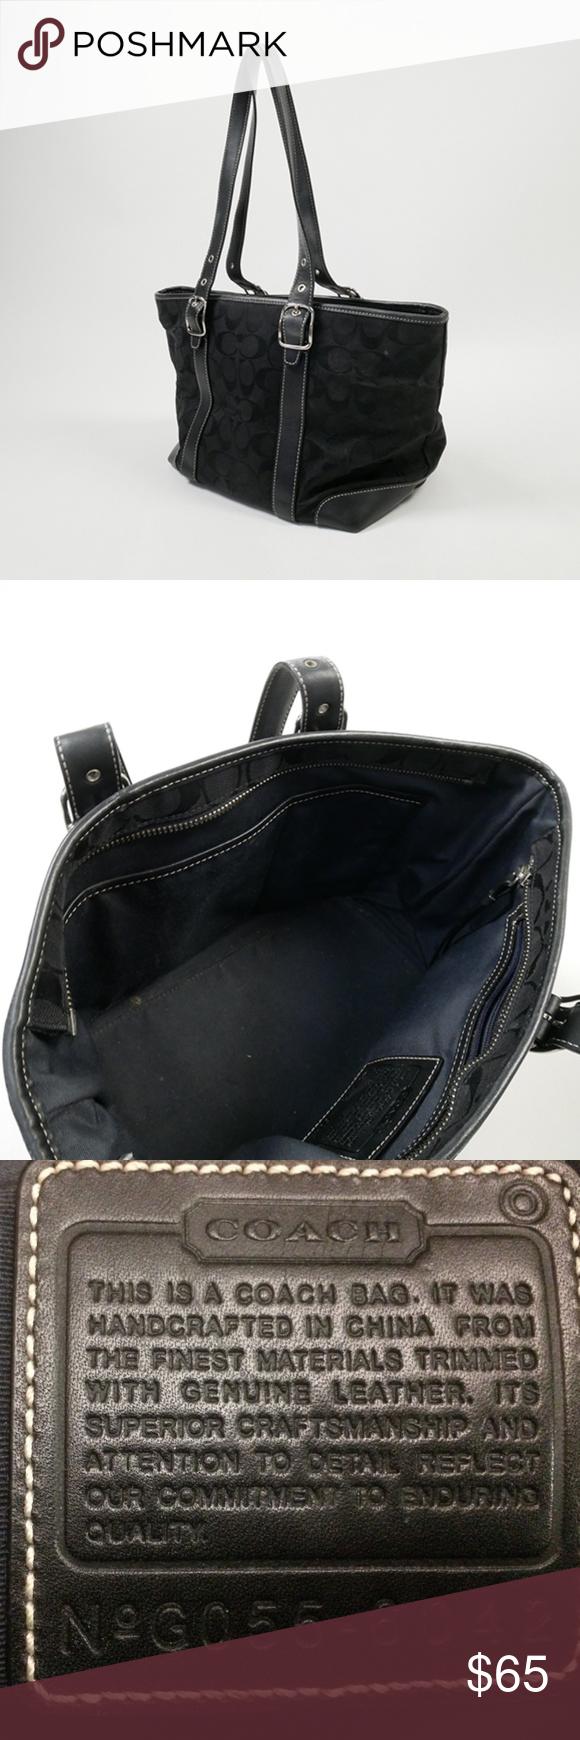 b9241d642a COACH 6042 Black Signature Tote Bag Authentic Coach 6042 Signature Print  Classic Logo Purse Handbag Silver